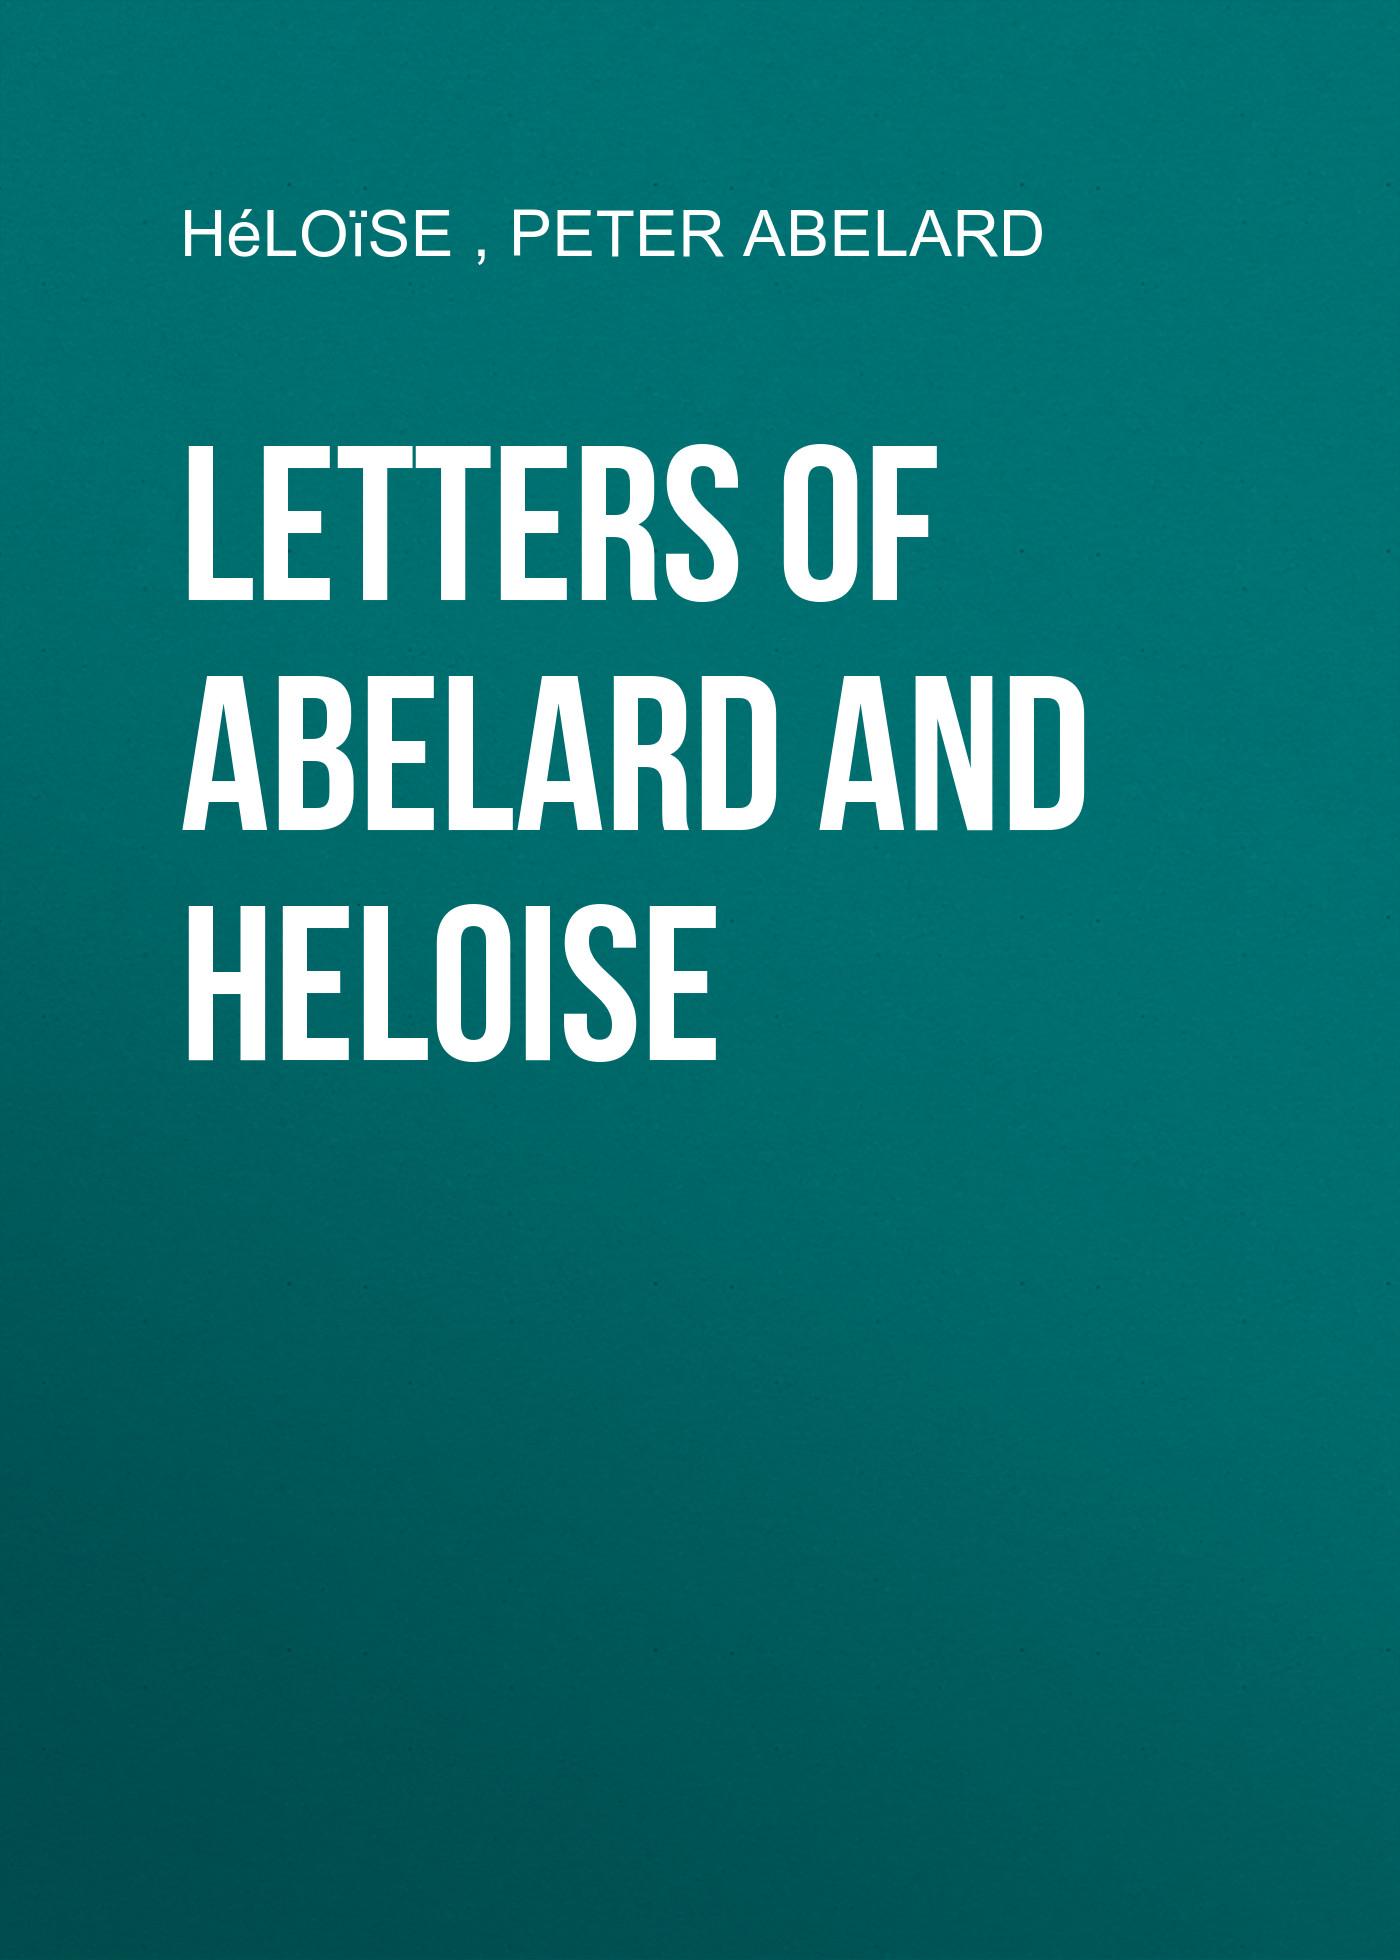 Peter Abelard Letters of Abelard and Heloise girls letters sequin tee